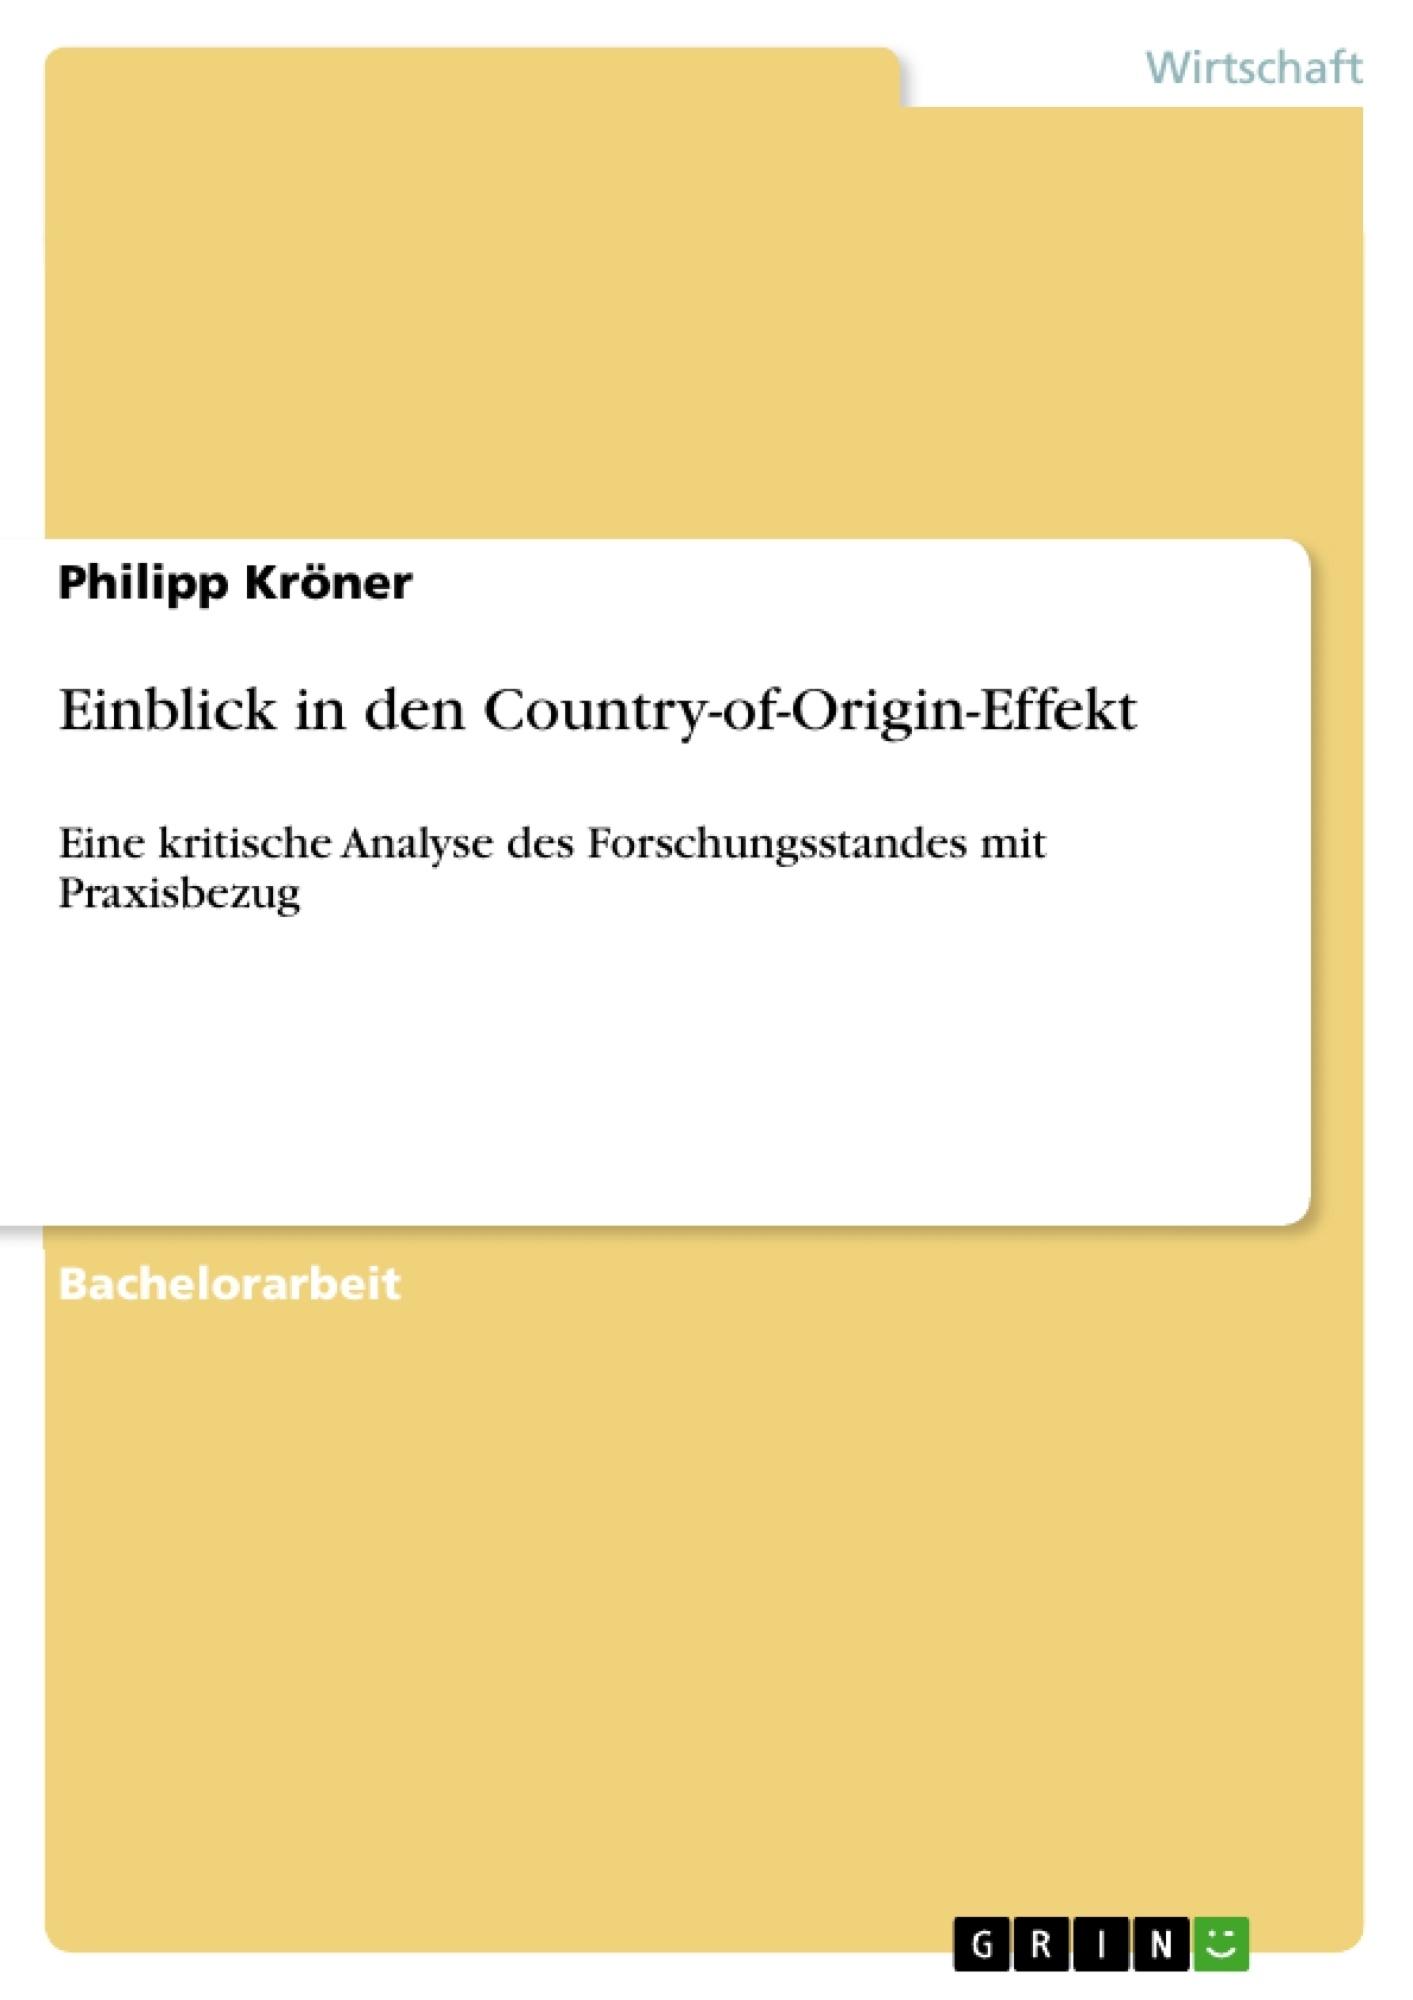 Titel: Einblick in den Country-of-Origin-Effekt